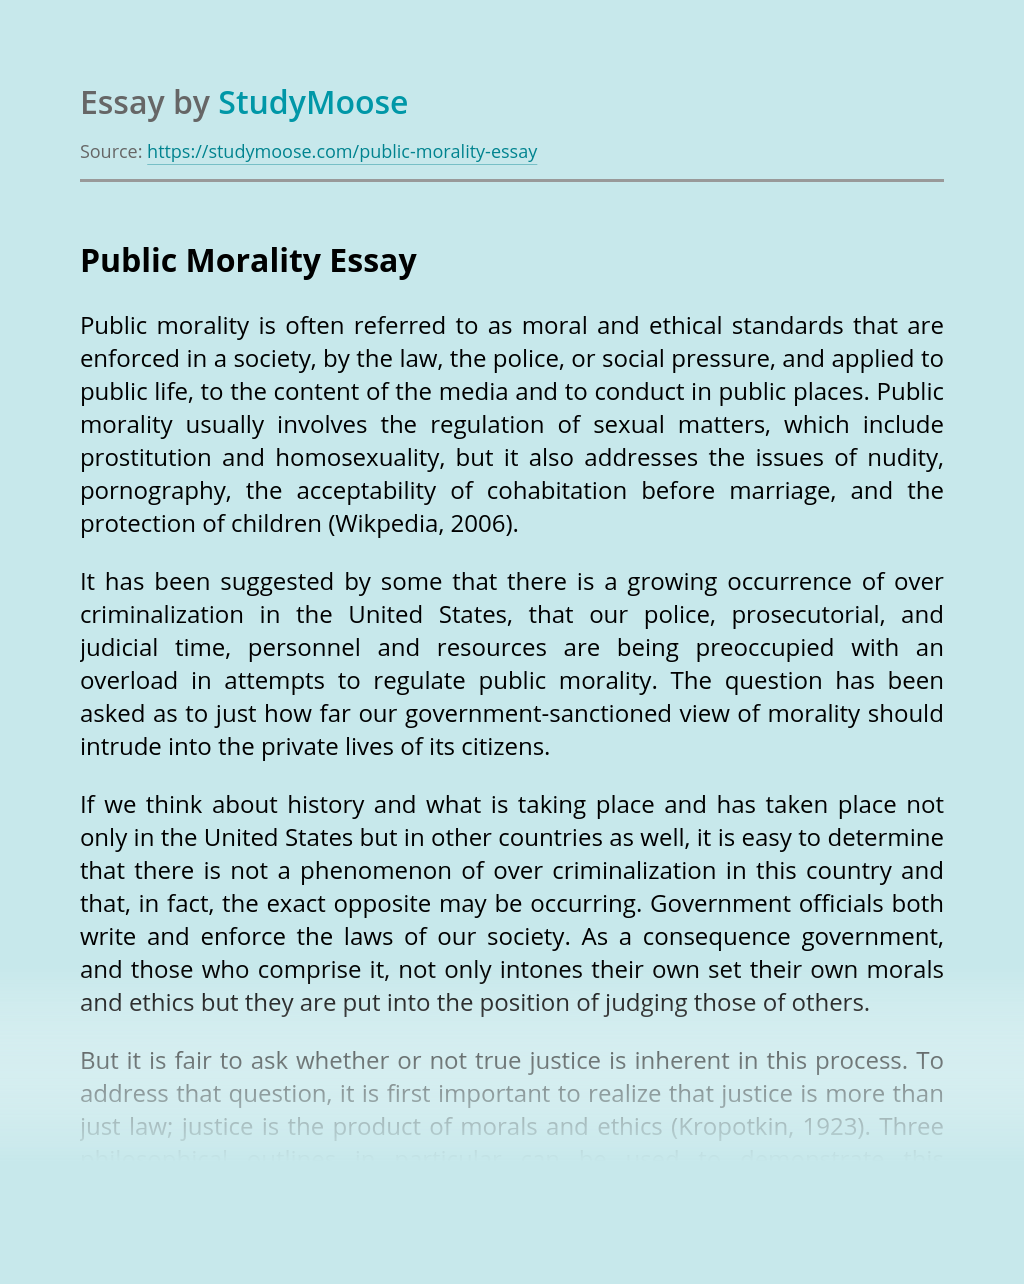 Public Morality